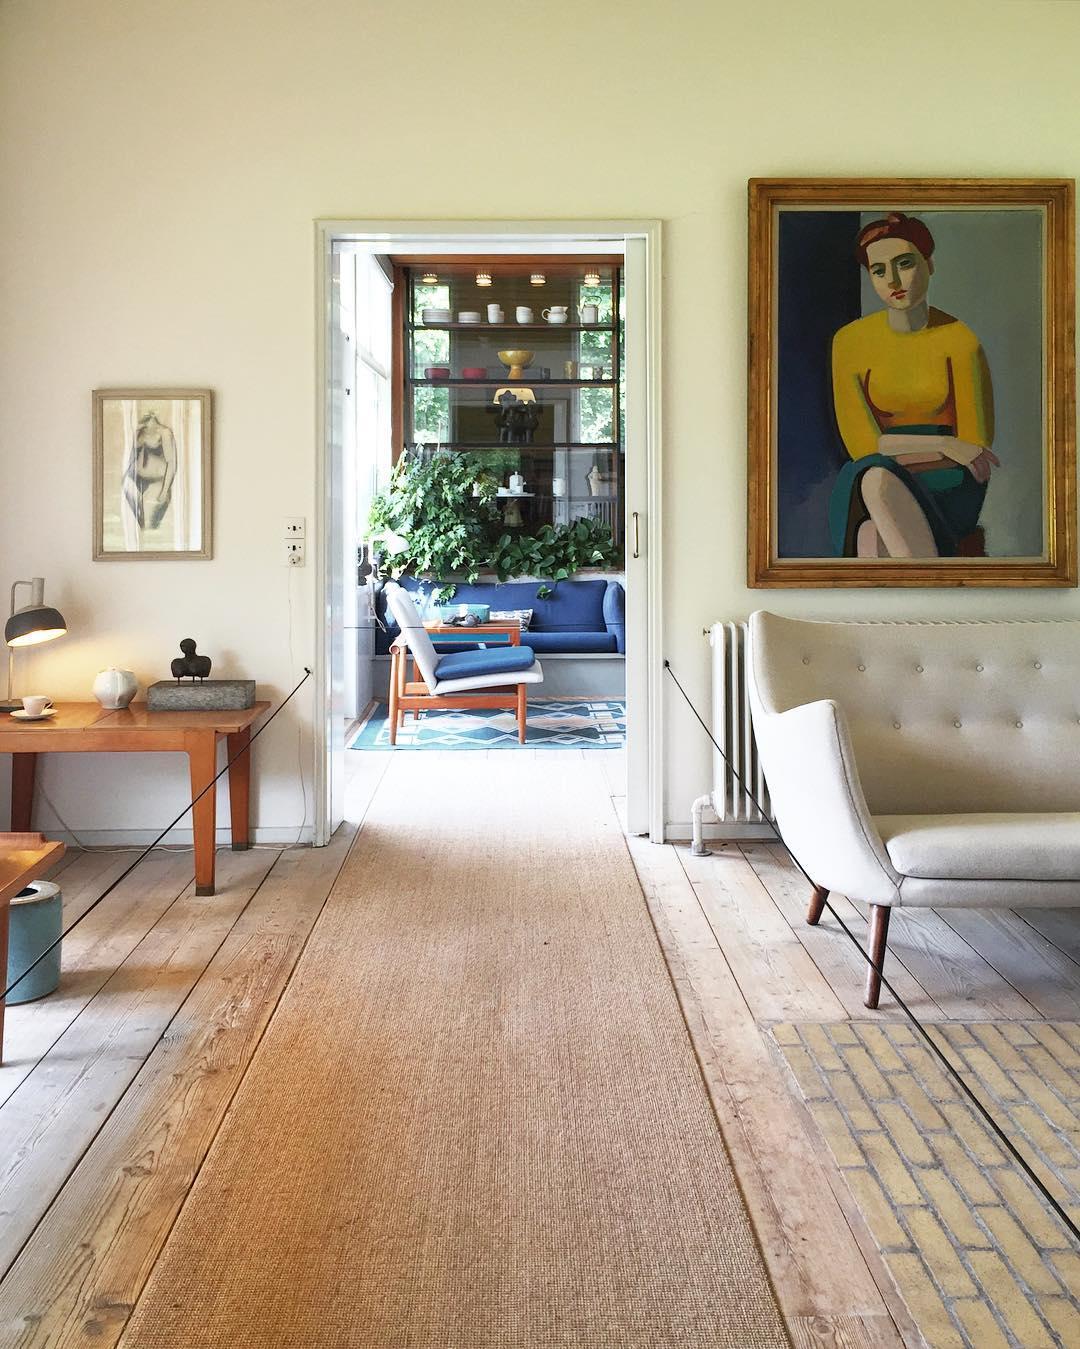 Finn Juhl's House, Charlottenlund, Denmark